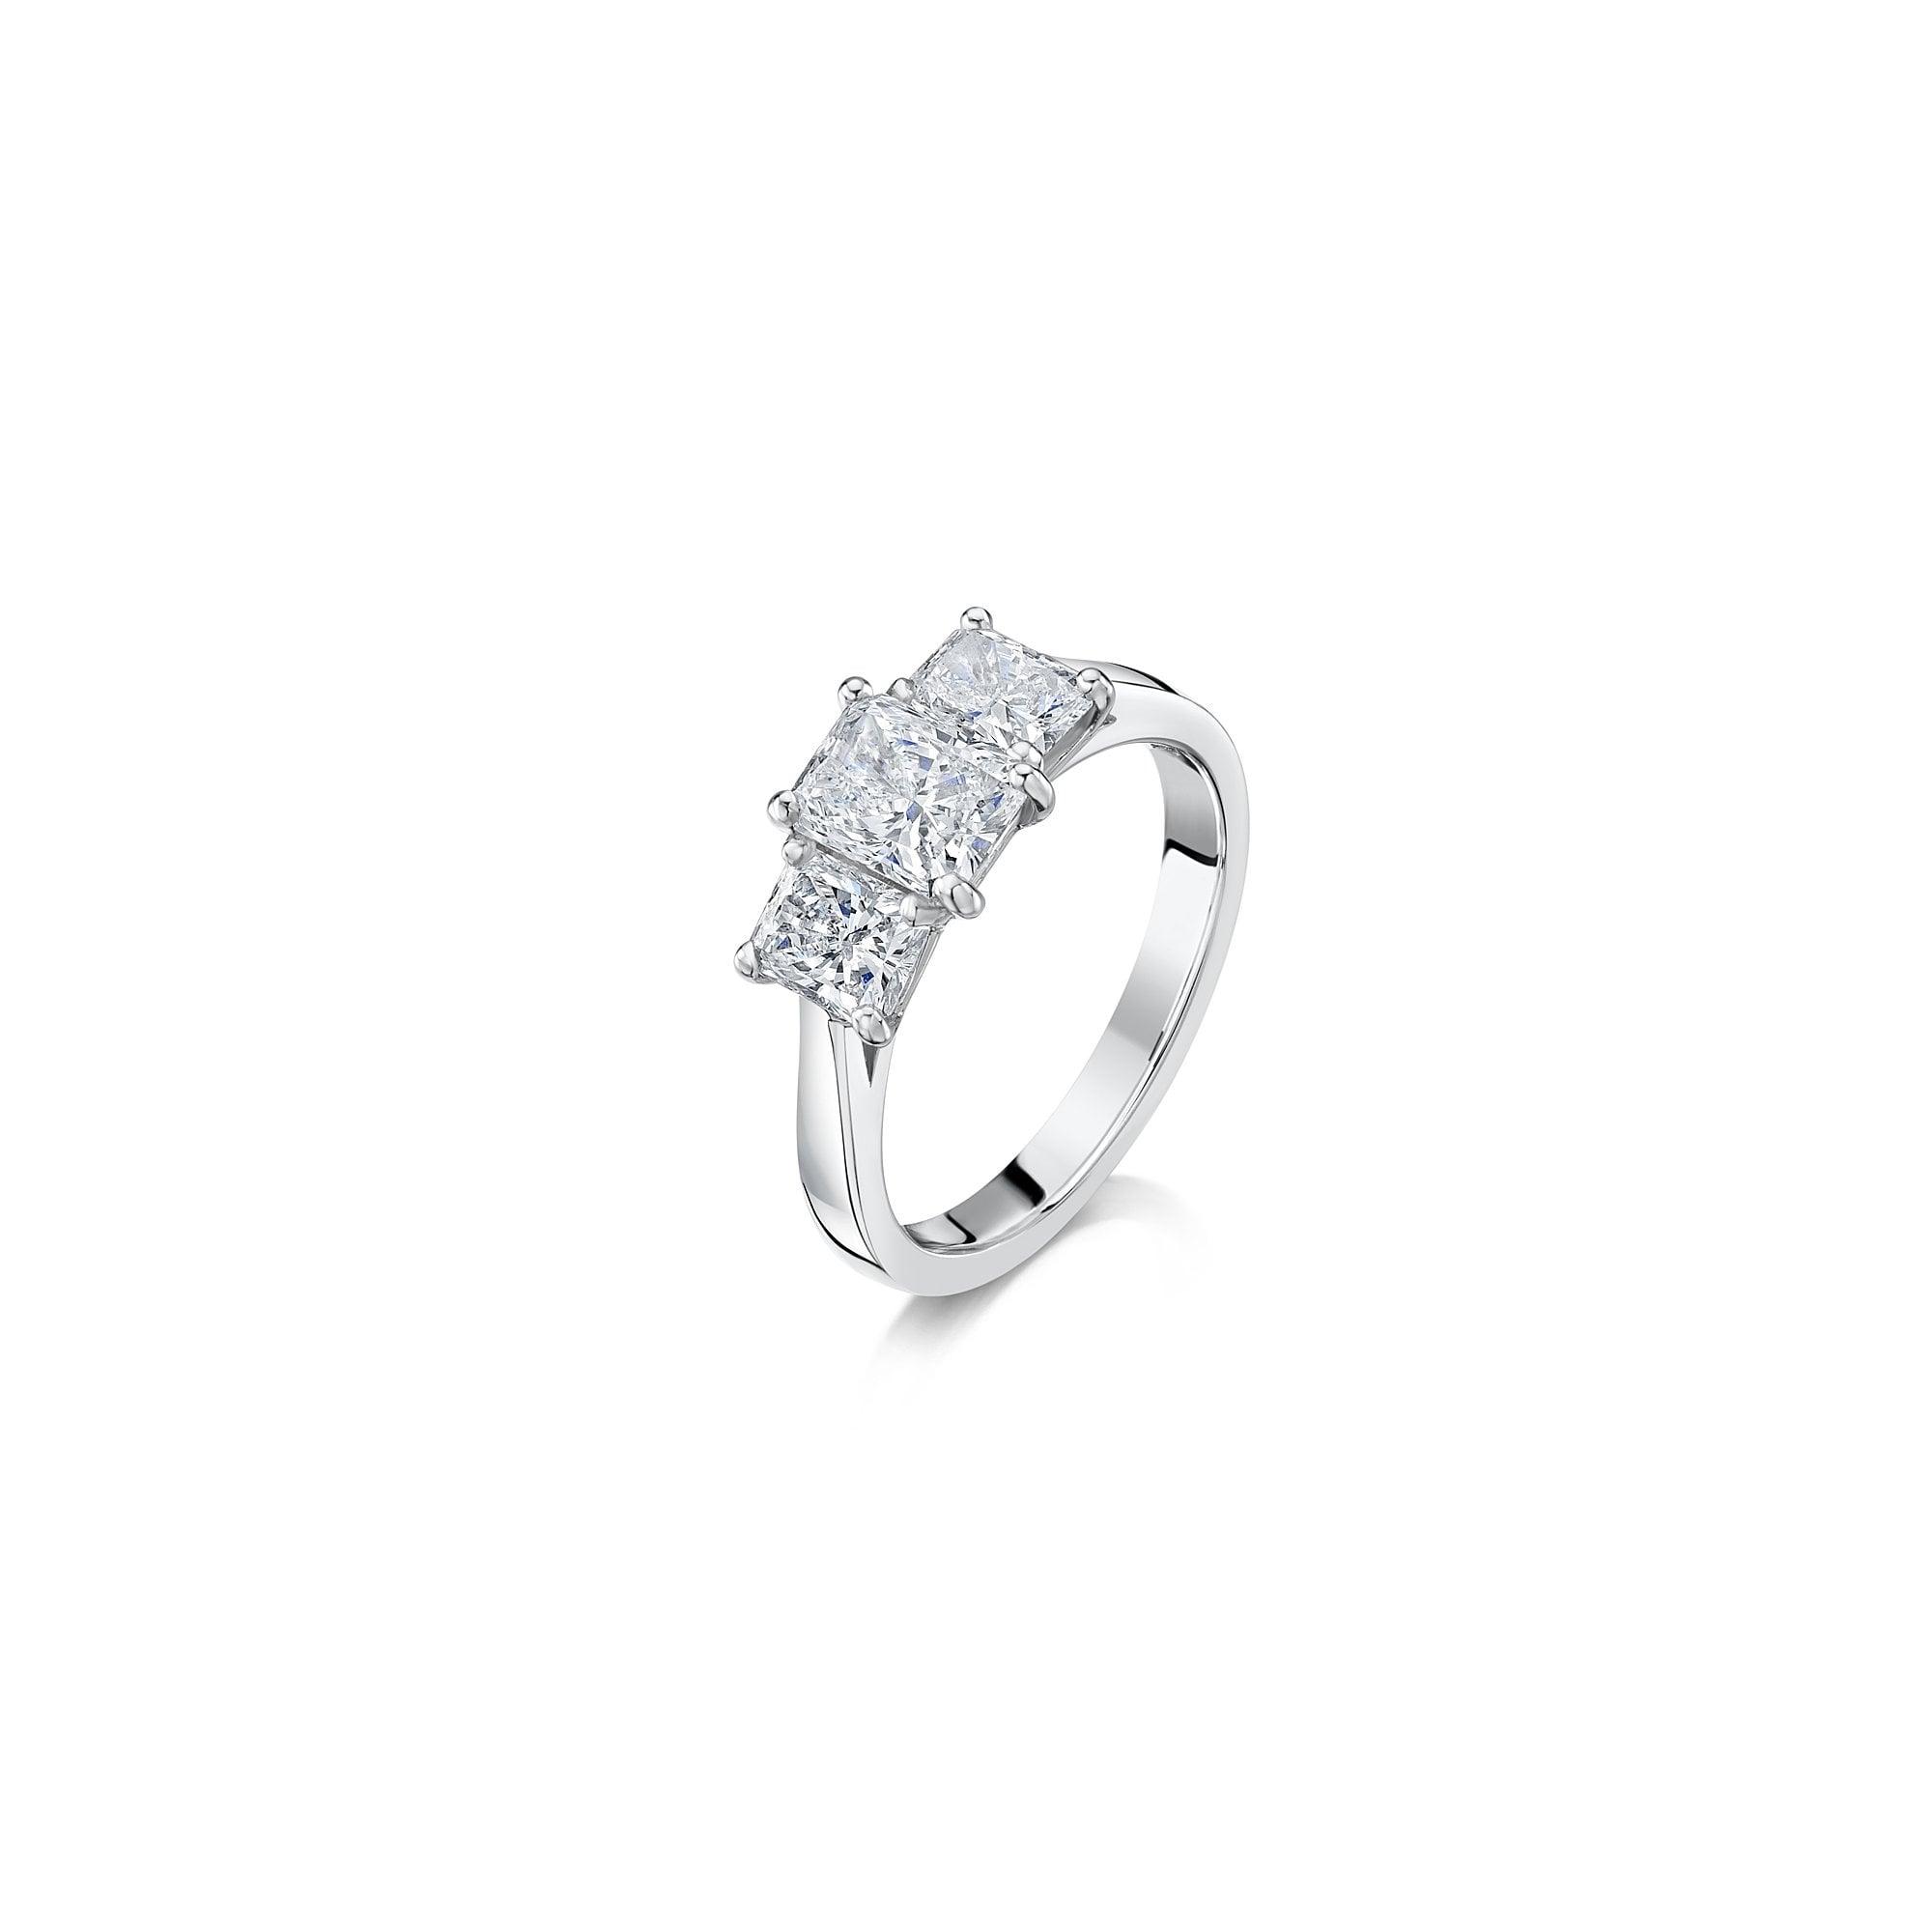 6d320be0430 2.08ct Three Stone Radiant Cut Diamond Ring in Platinum